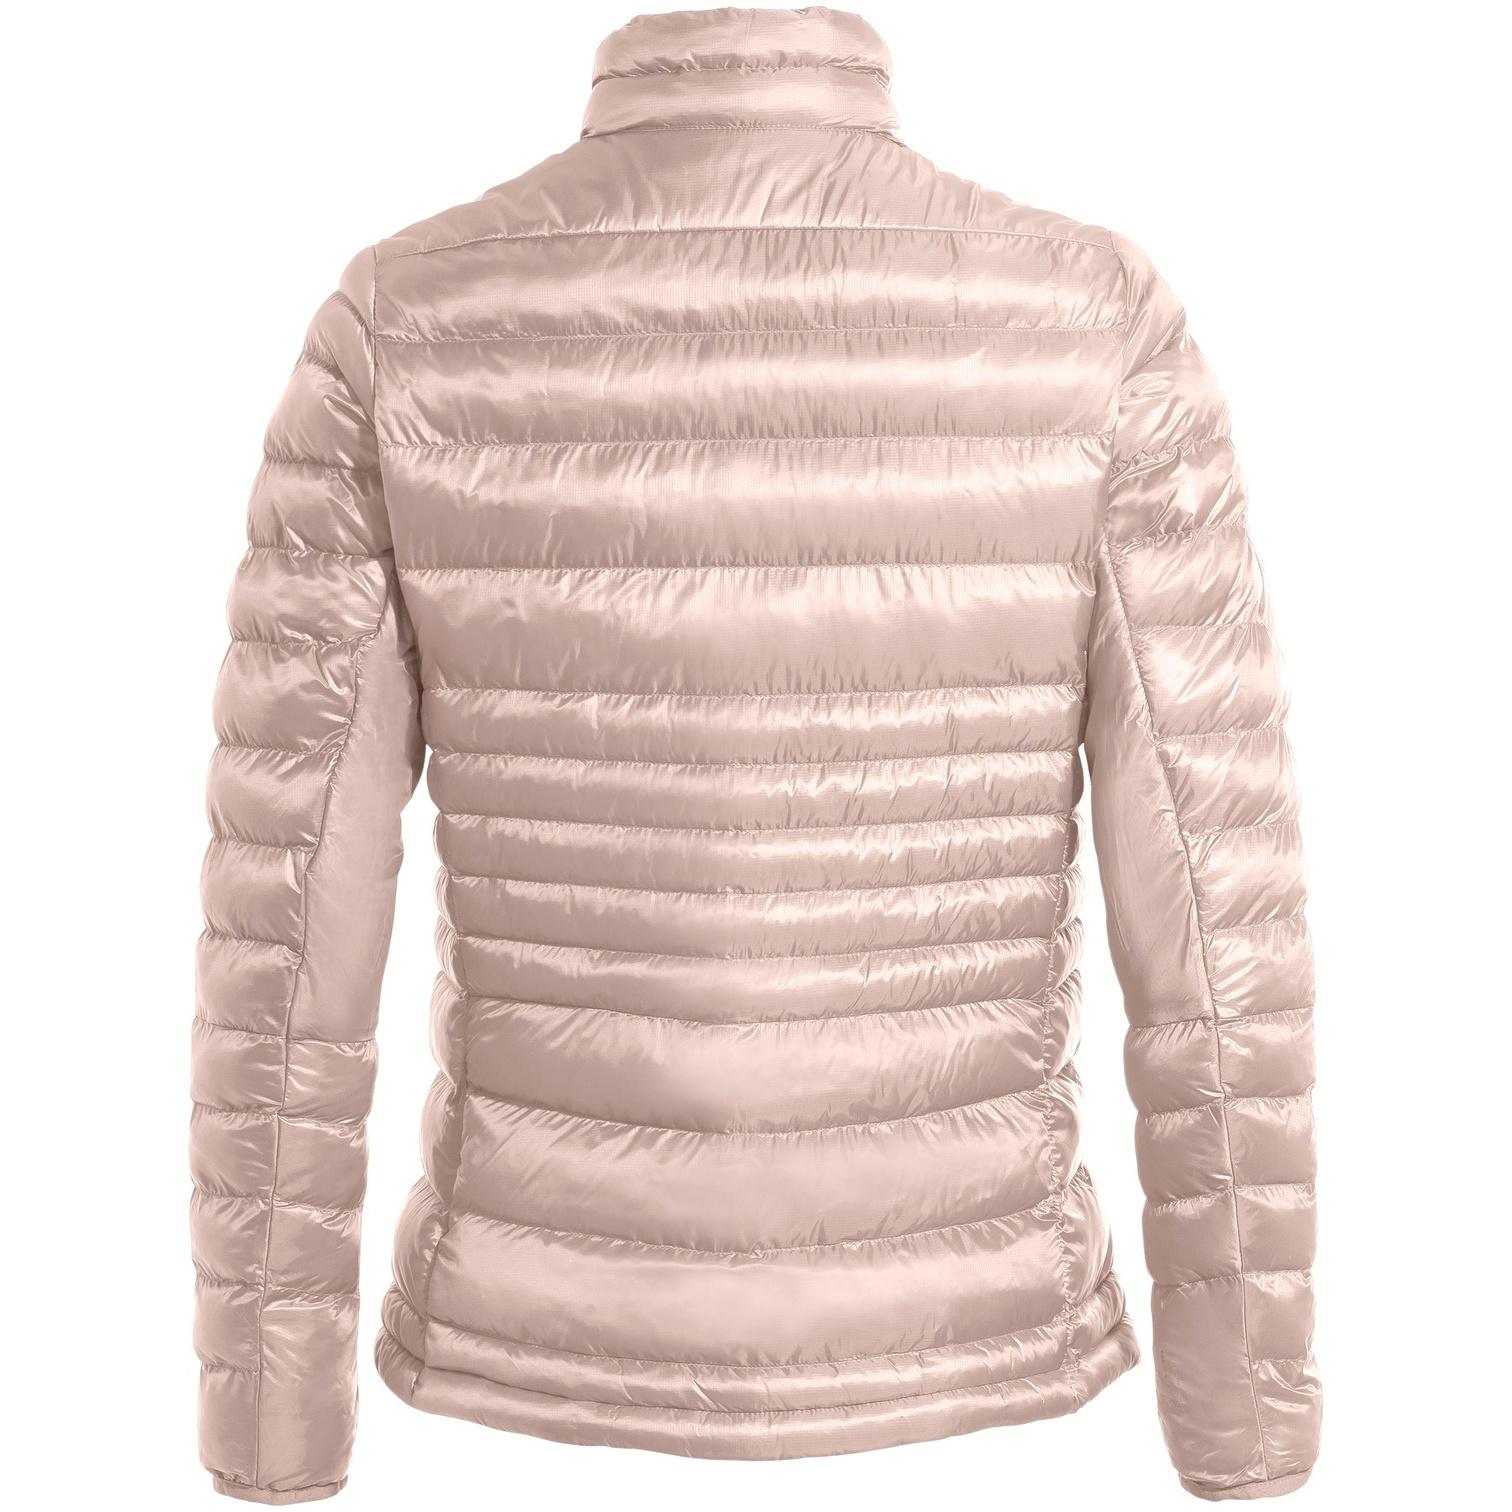 Image of Vaude Women's Batura Insulation Jacket - sand rose